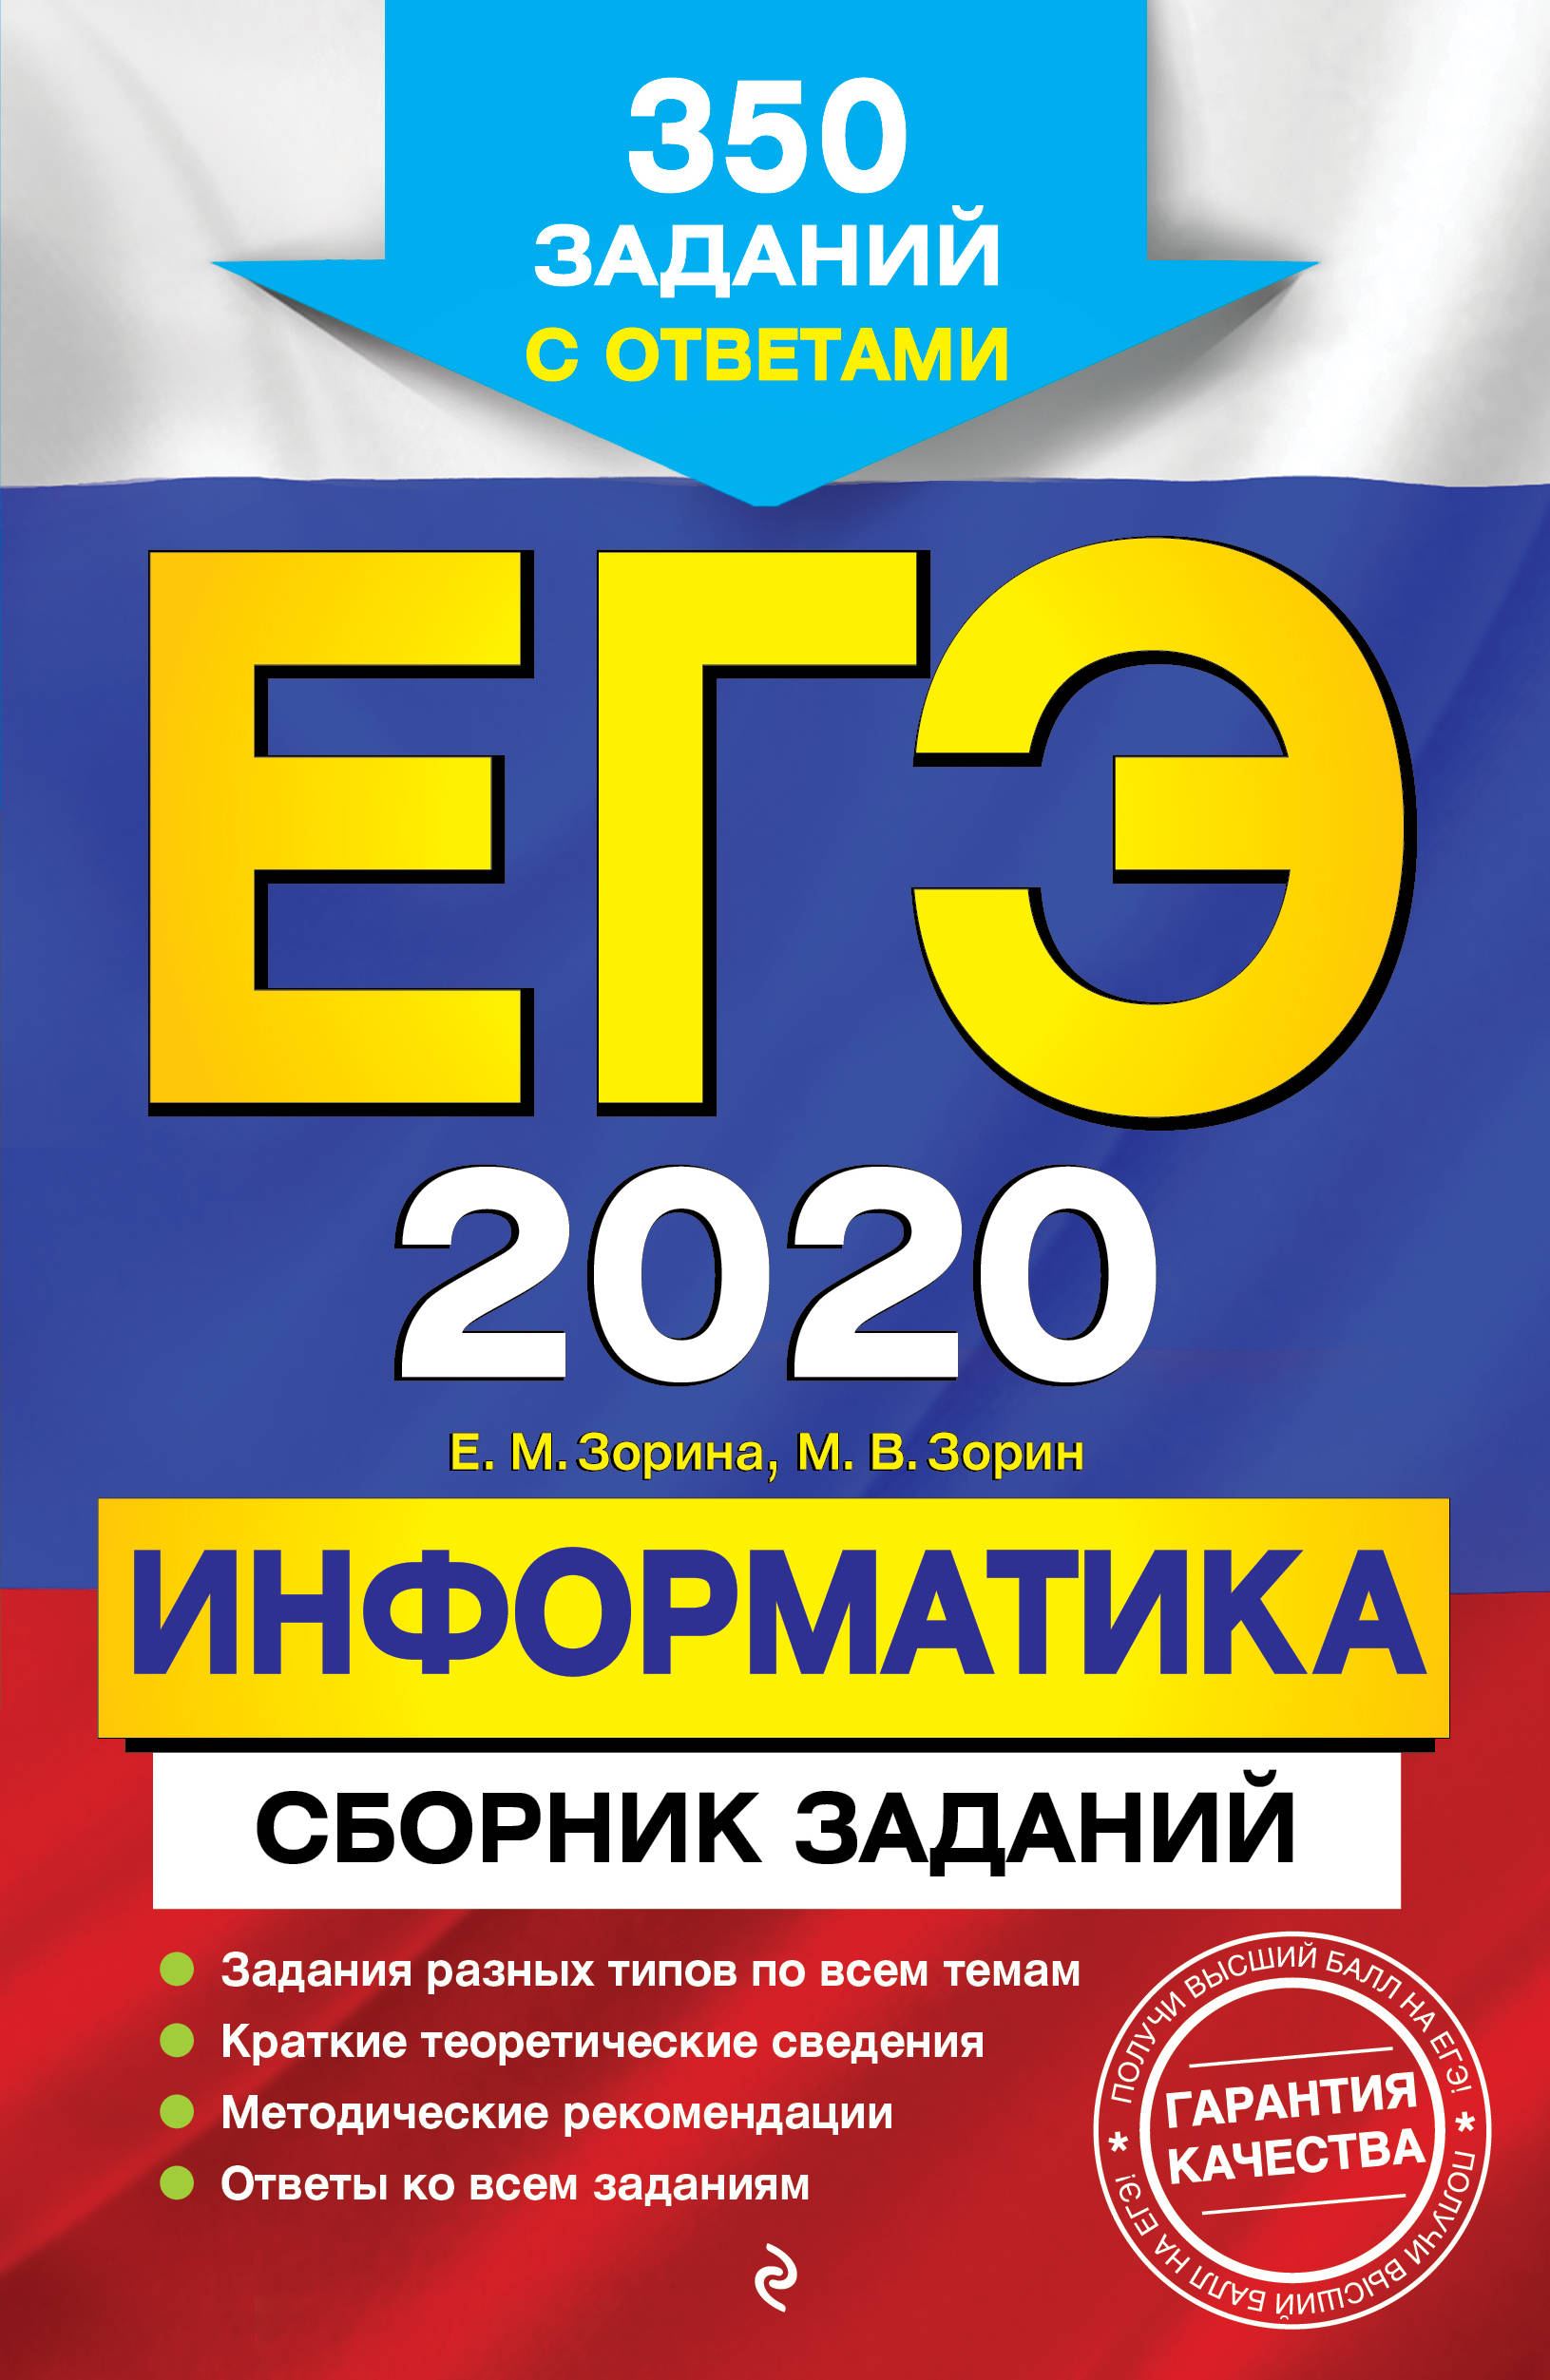 Е. М. Зорина, М. В. Зорин ЕГЭ-2020. Информатика. Сборник задани зорина е м егэ 2019 информатика сборник заданий 350 заданий с ответами